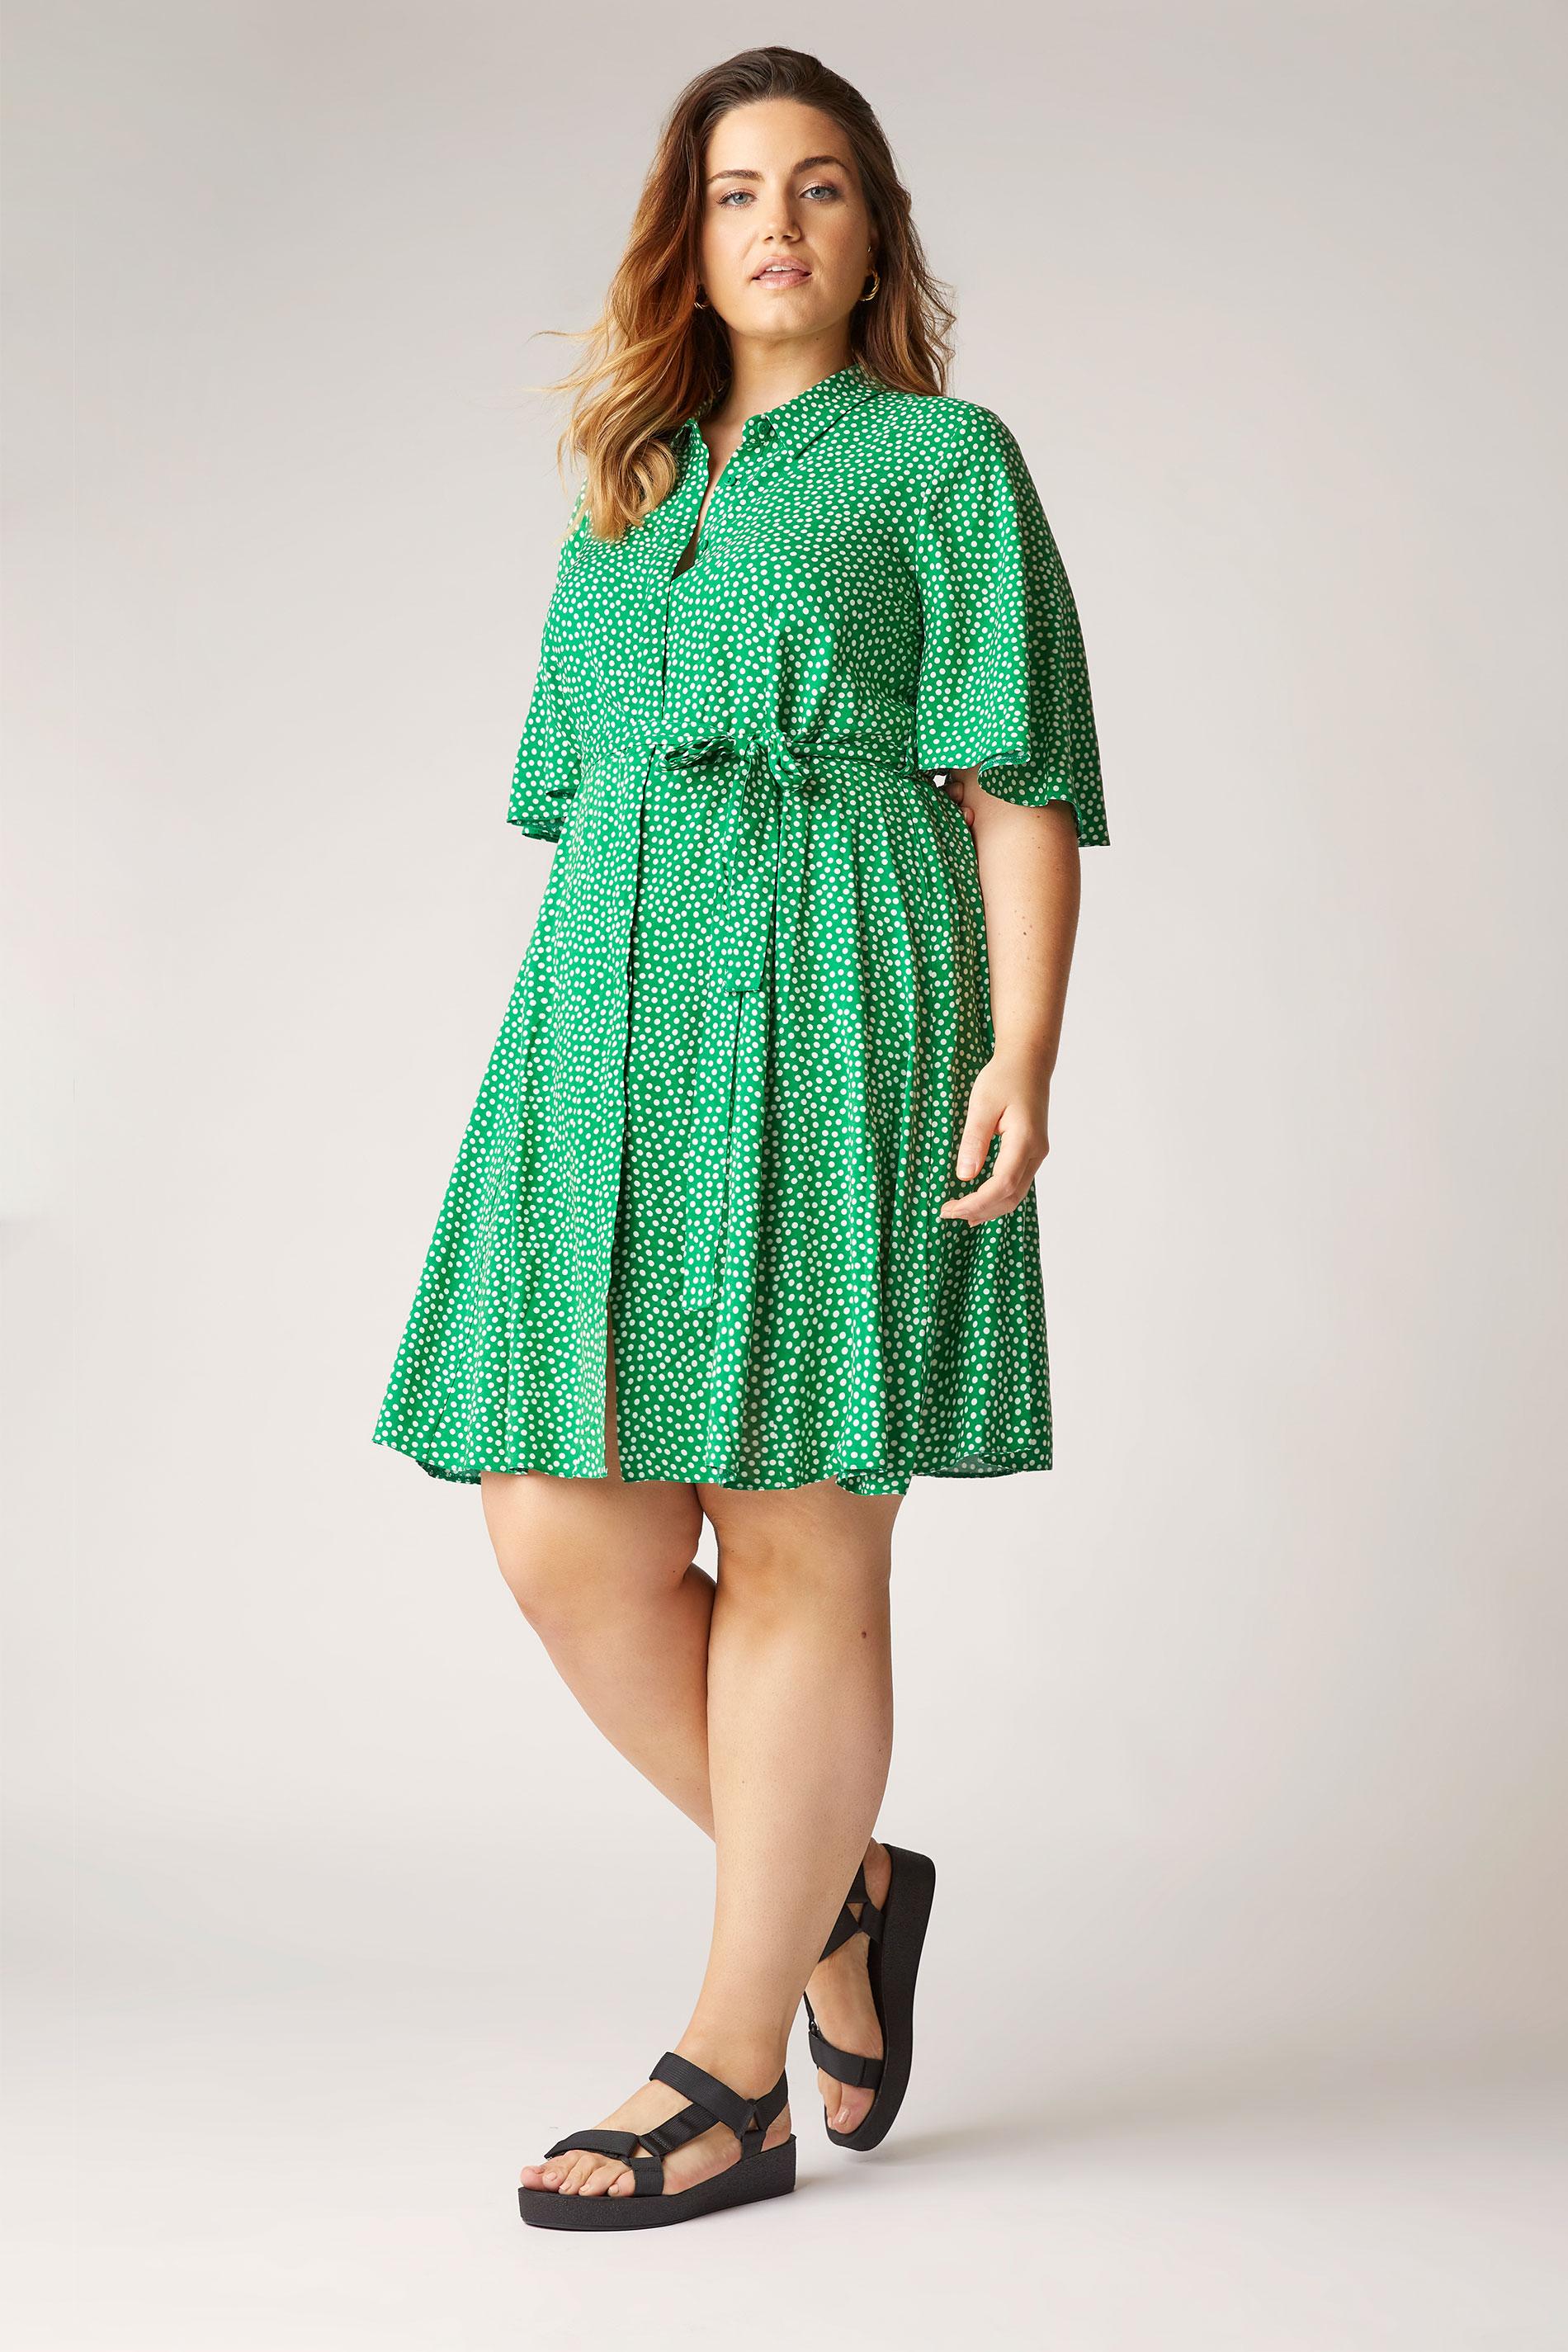 THE LIMITED EDIT Green Polka Dot Shirt Mini Dress_A.jpg